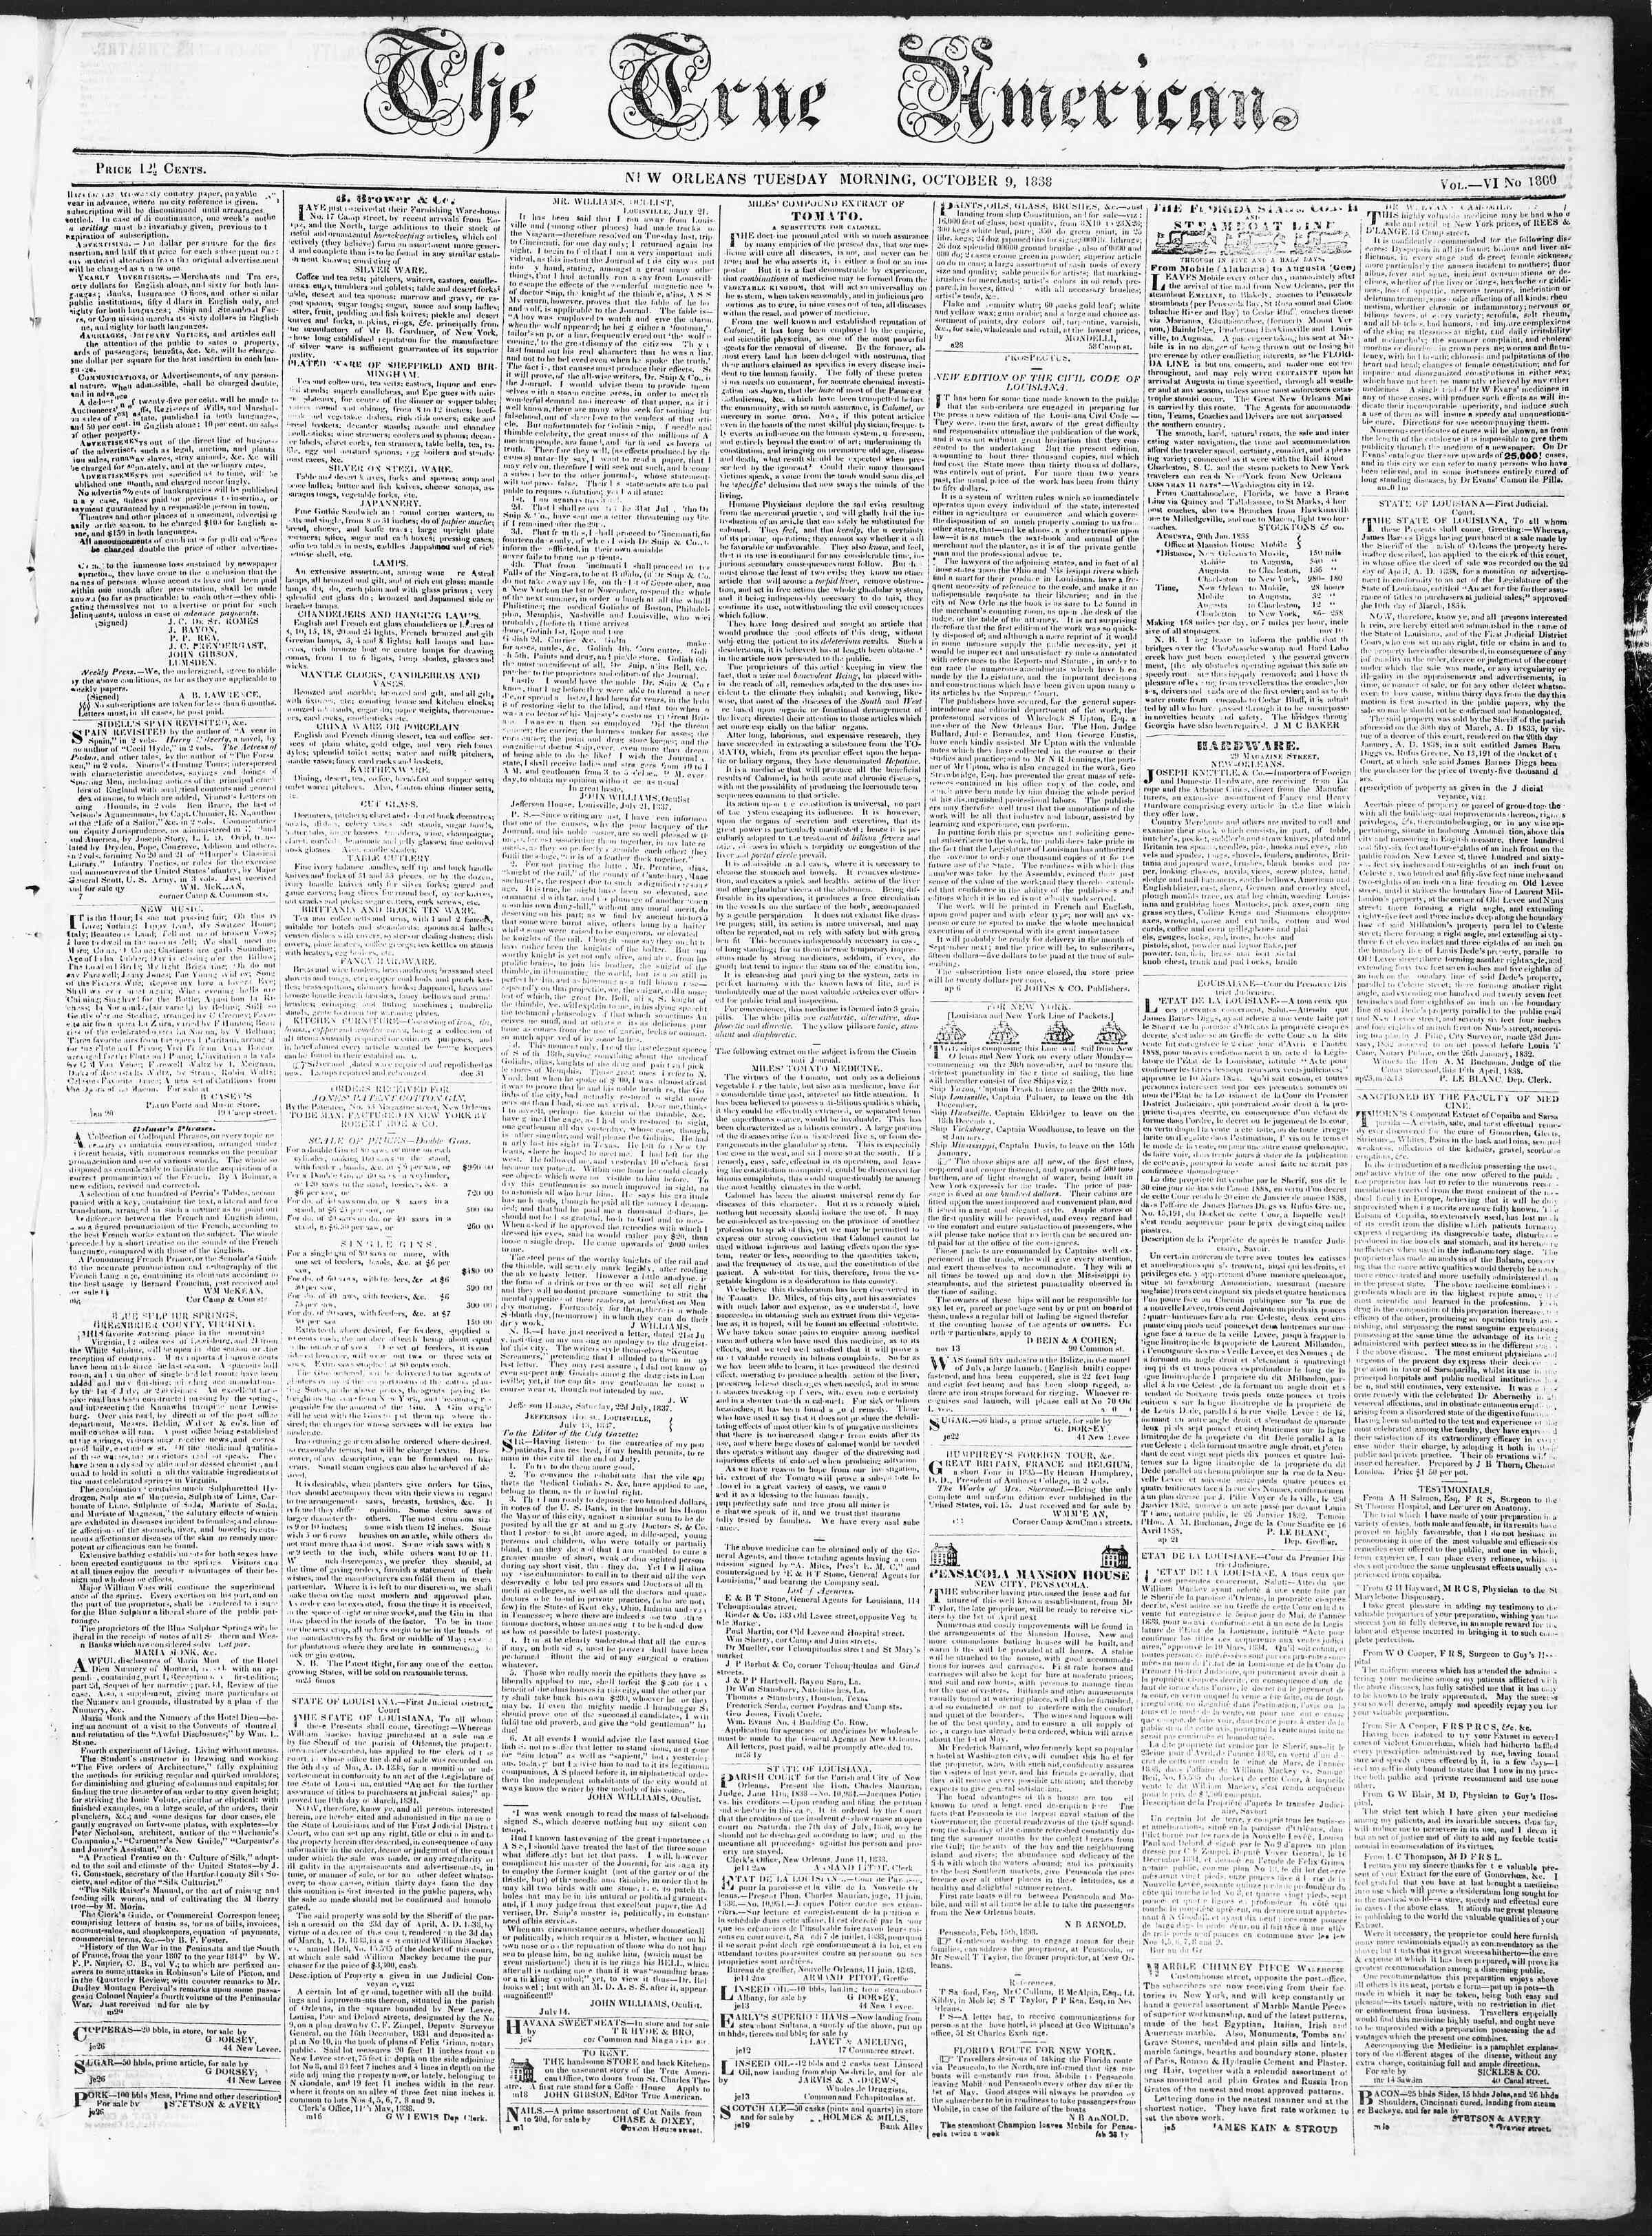 October 9, 1838 Tarihli True American Gazetesi Sayfa 1